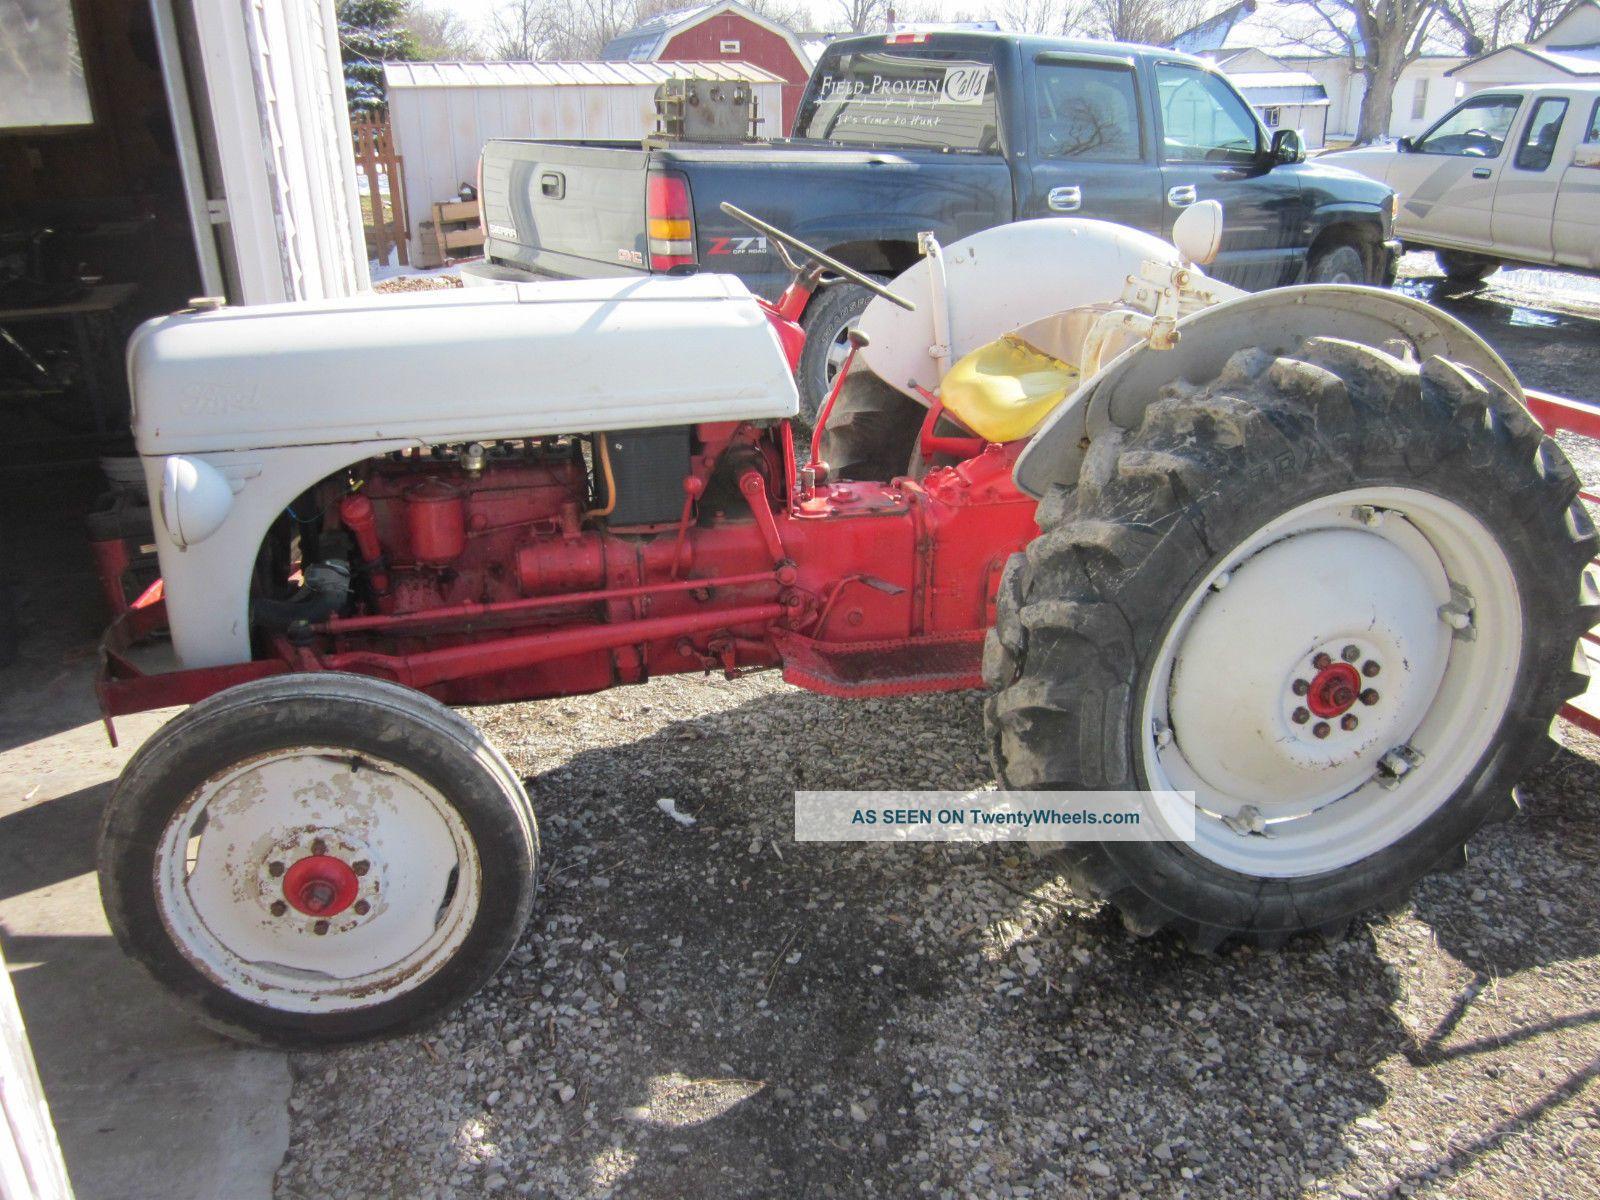 Sherman Backhoes For Ford Tractors : Ford n sherman backhoe